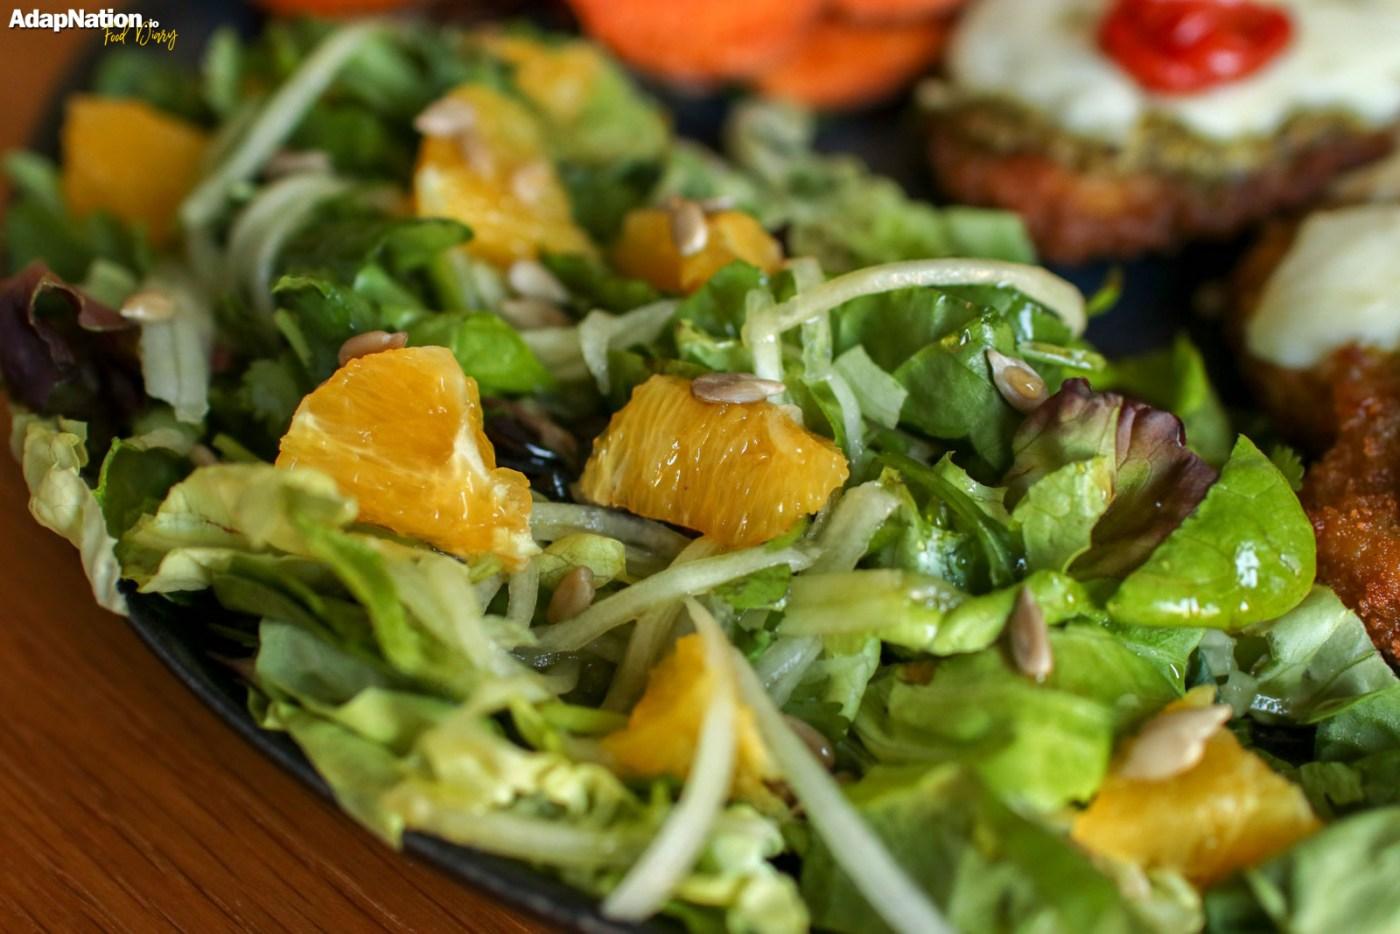 Mozzarella Chicken with Zesty Orange Salad & Sweet Potato Crisps